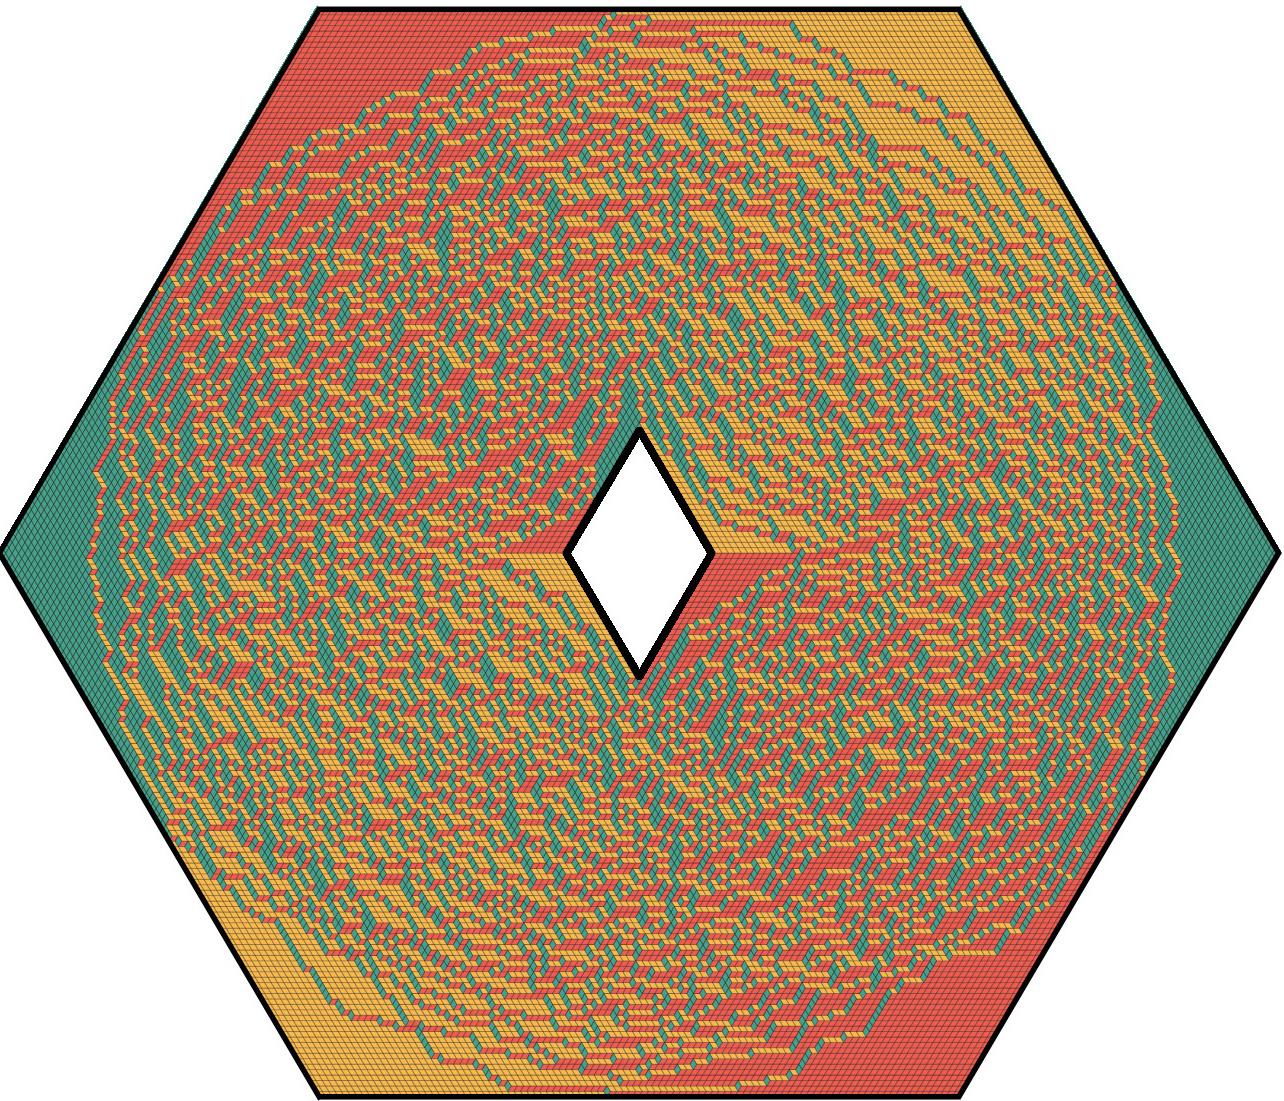 Uniformly random tiling of a hexagon with a hole